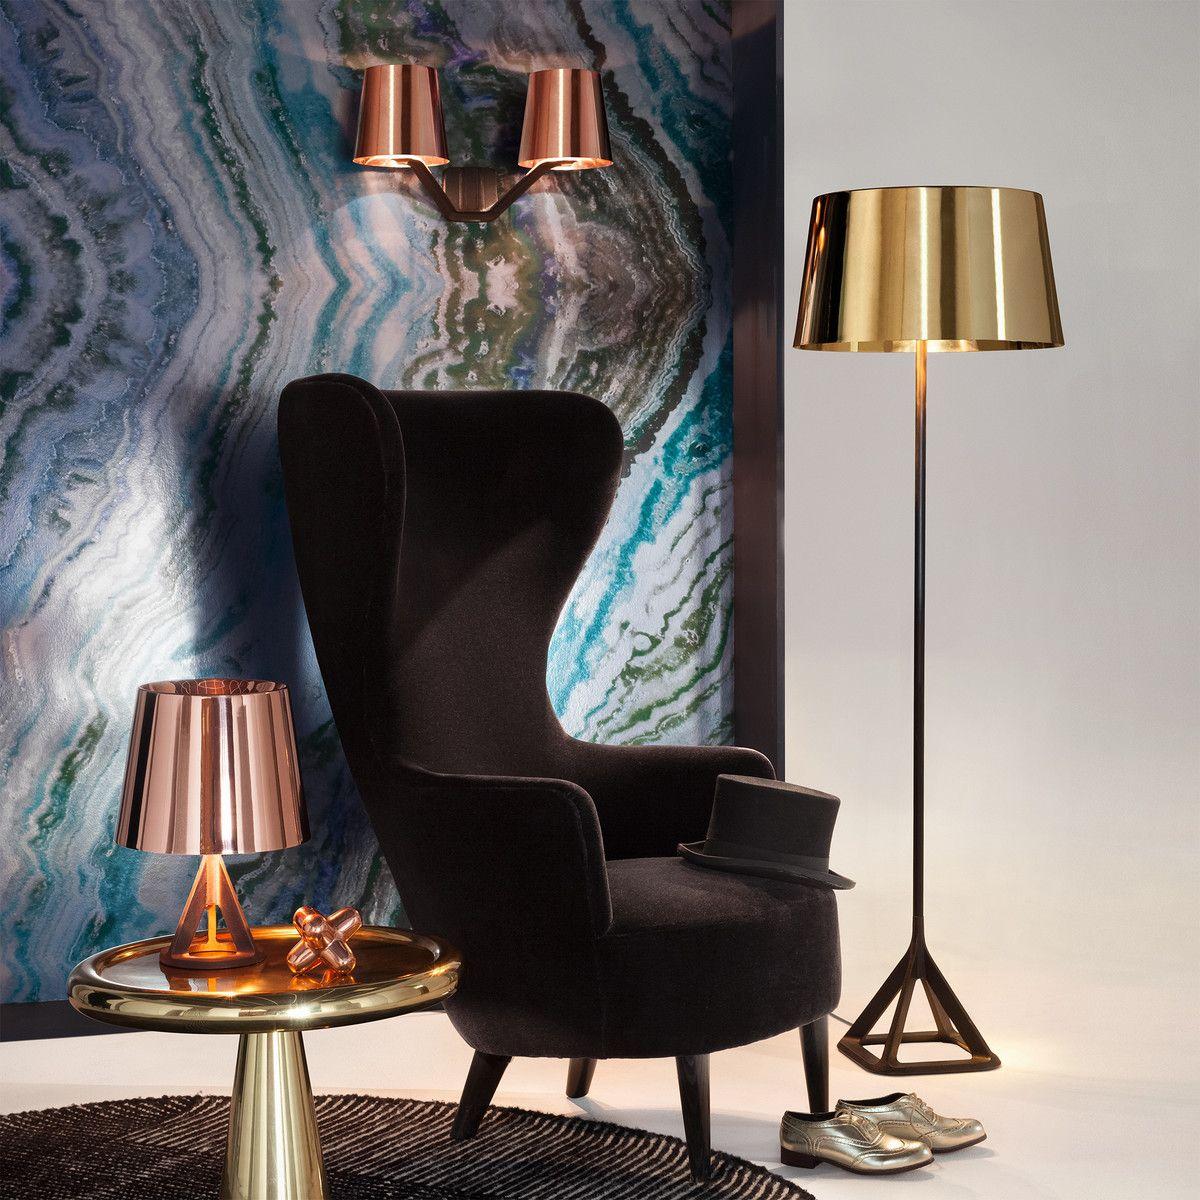 Tom Dixon Base Wall Light Furniture Design Interior Armchair Furniture